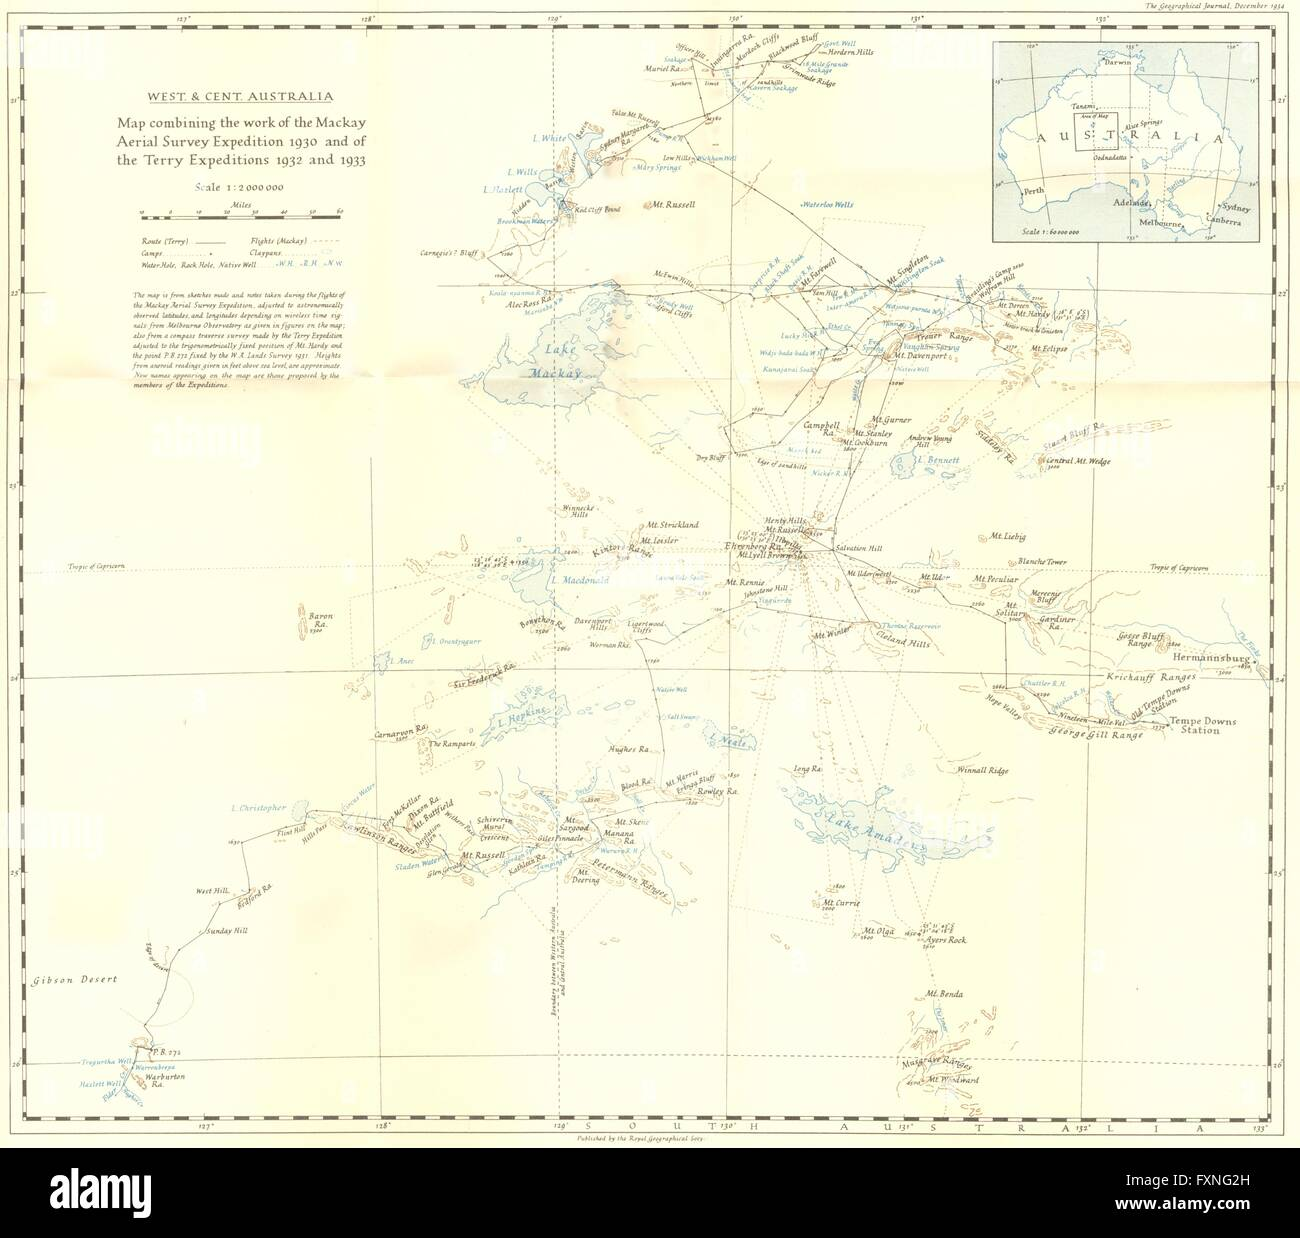 Mckay Australia Map.Australia W Central Mackay 1930 Terry 1932 33 1934 Vintage Map